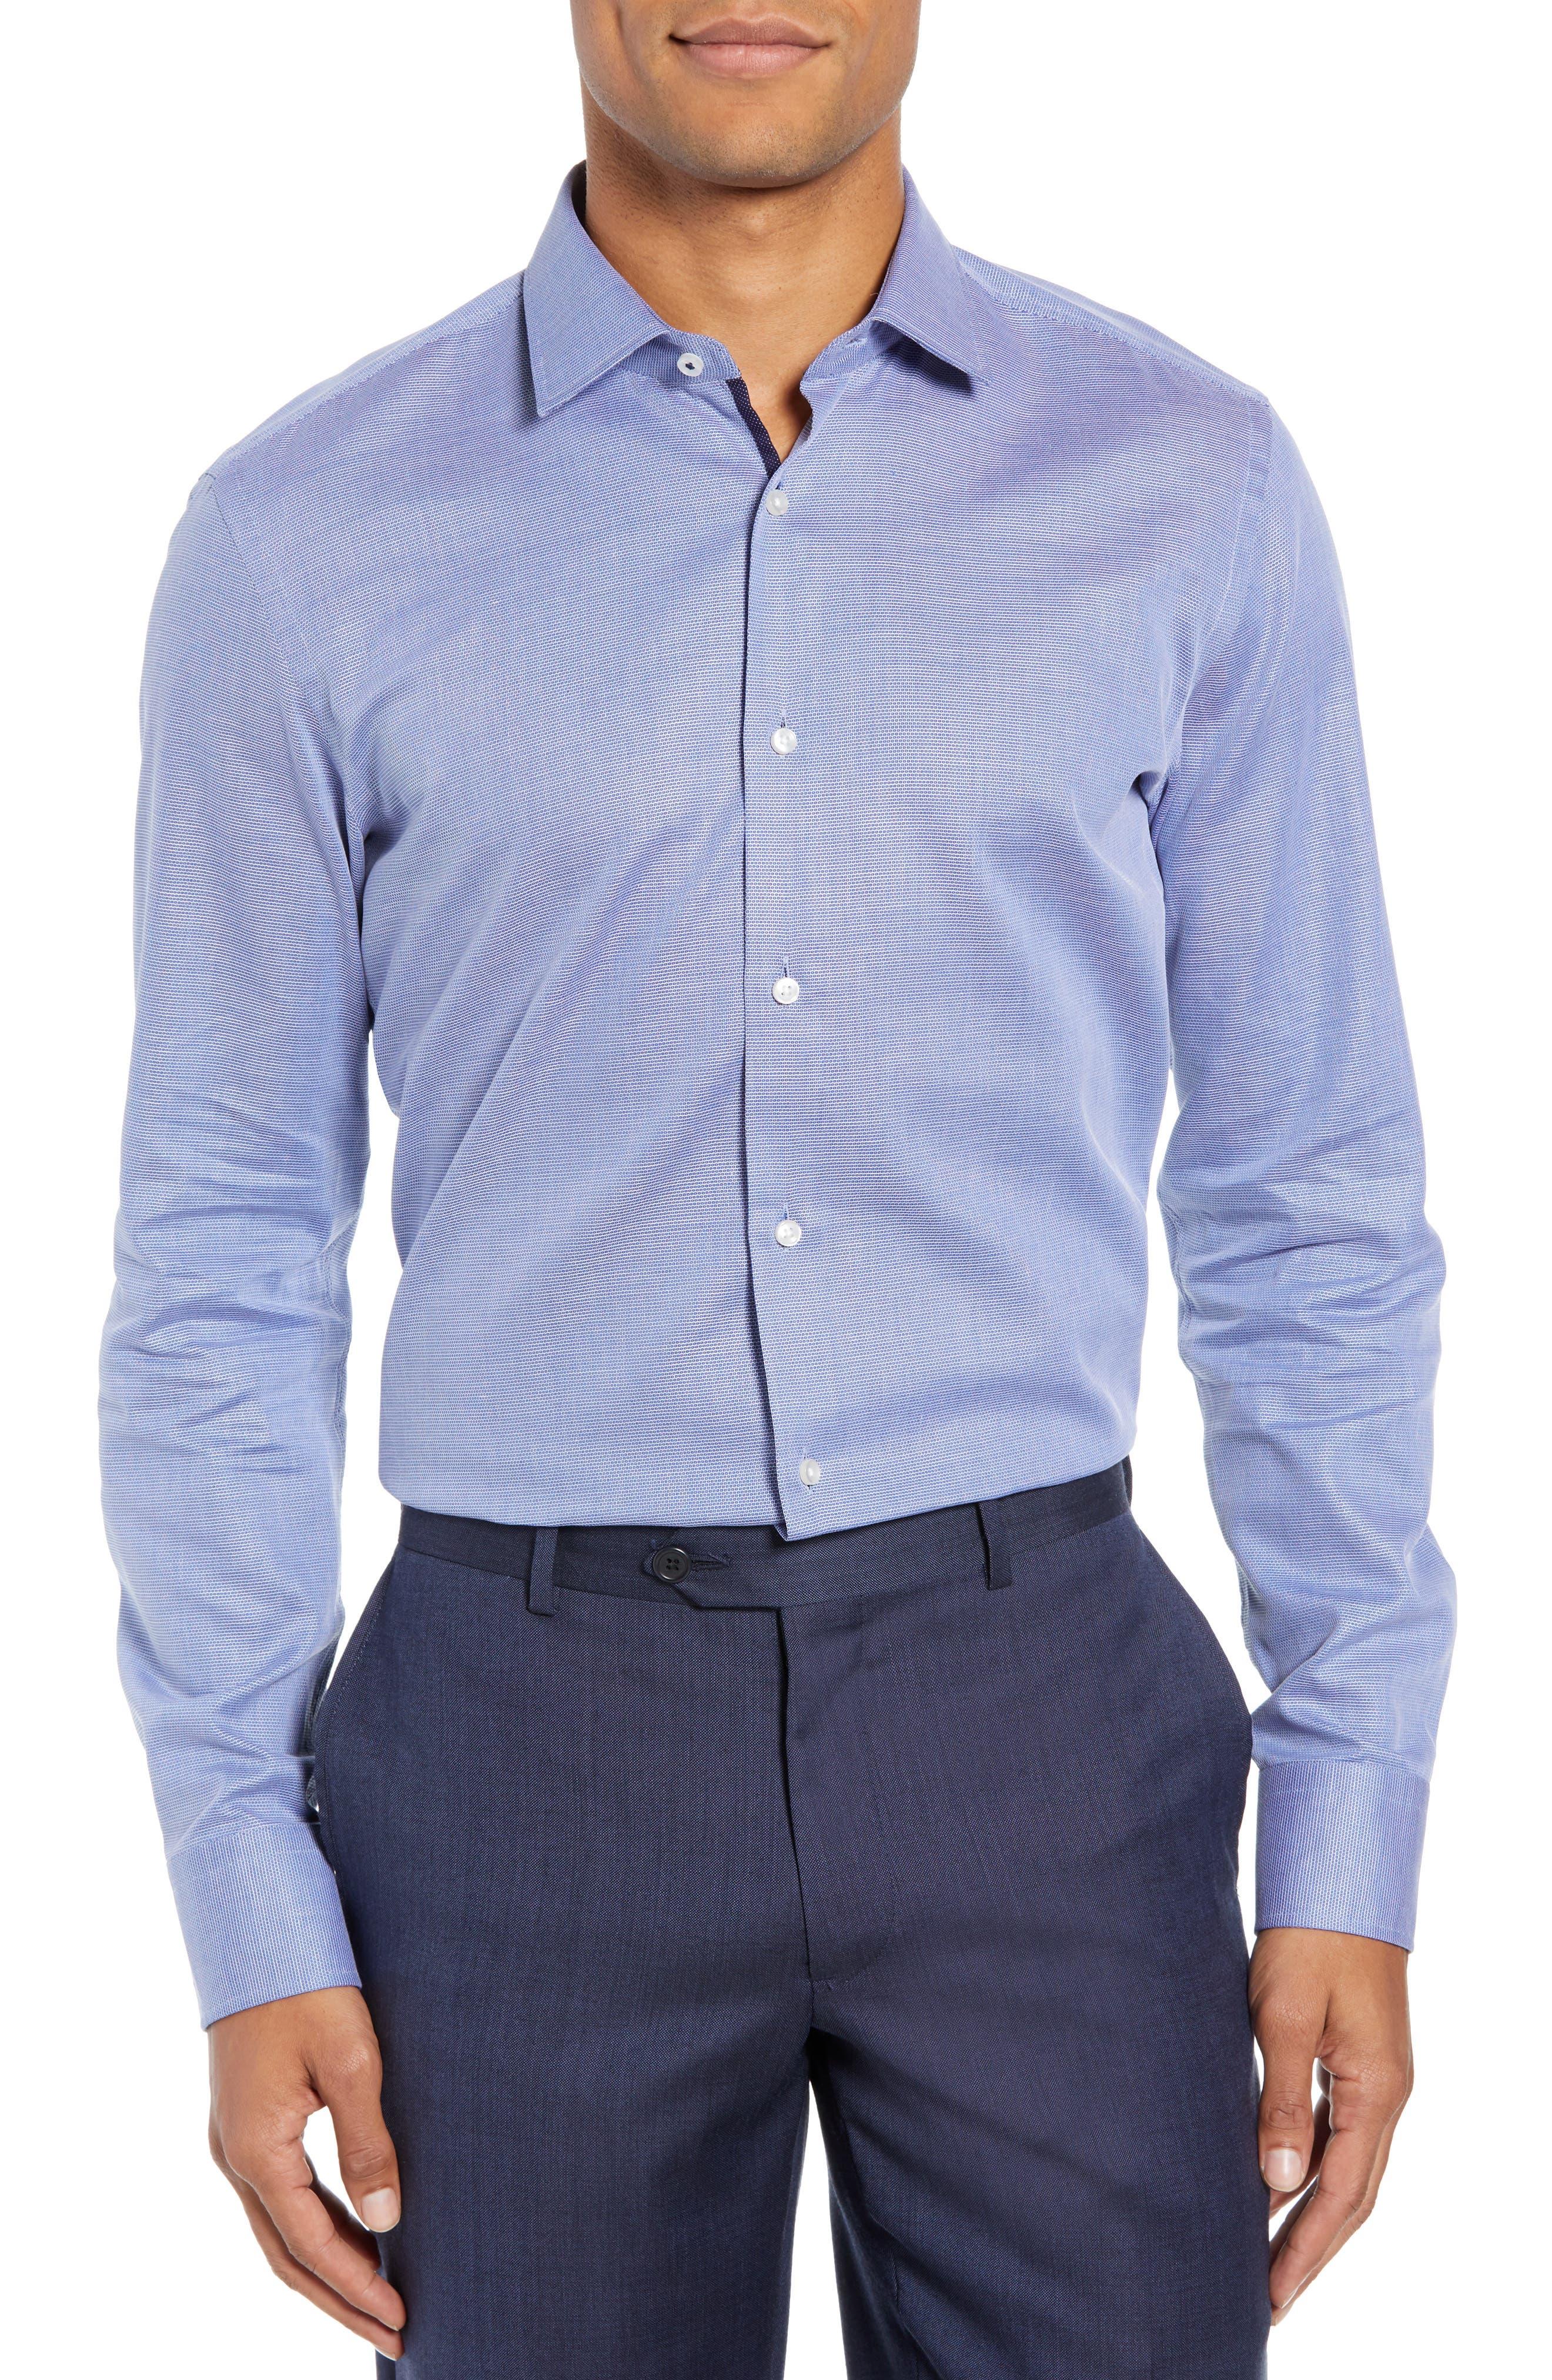 Jesse Slim Fit Solid Dress Shirt,                         Main,                         color, NAVY